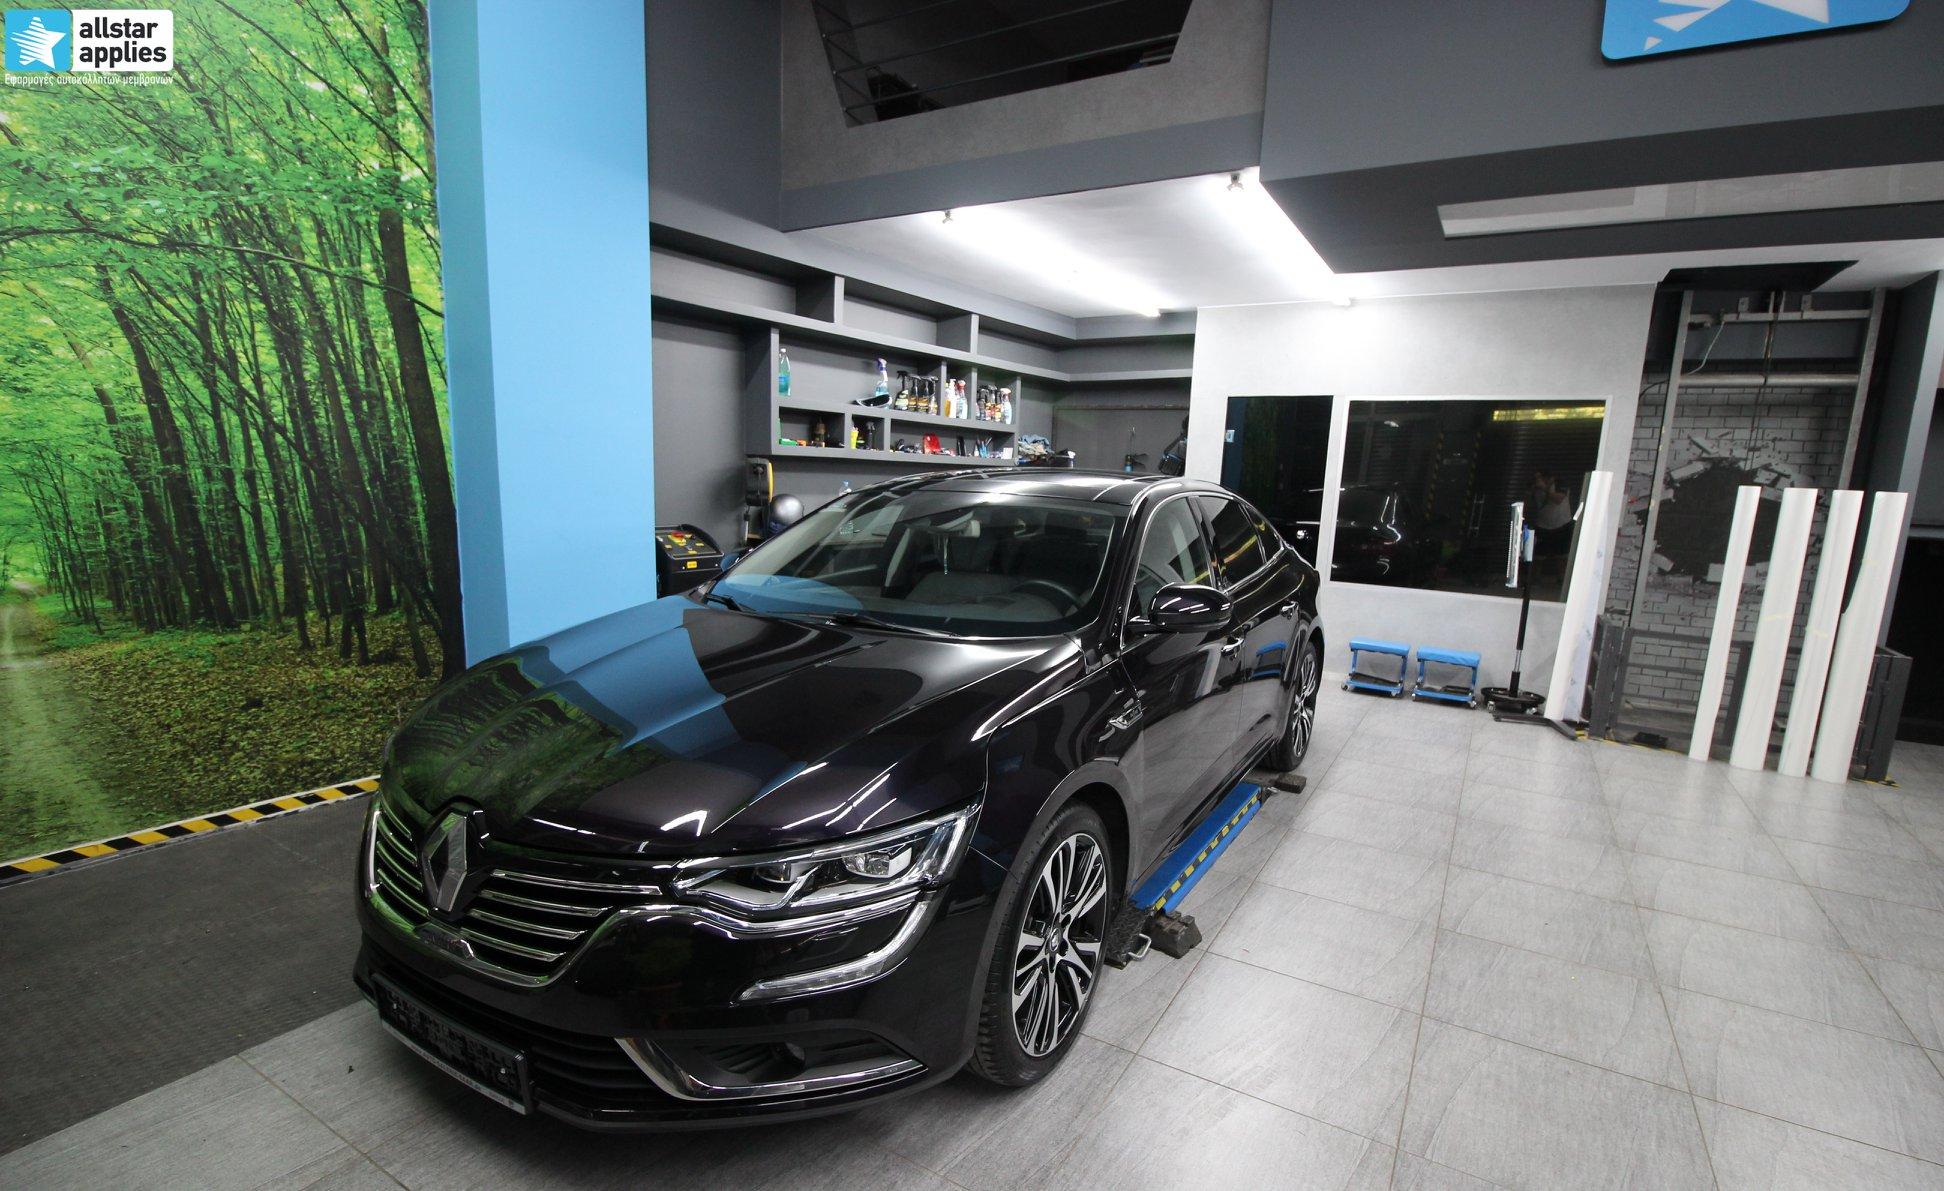 Renault Talisman - Satin Pearl White (18)